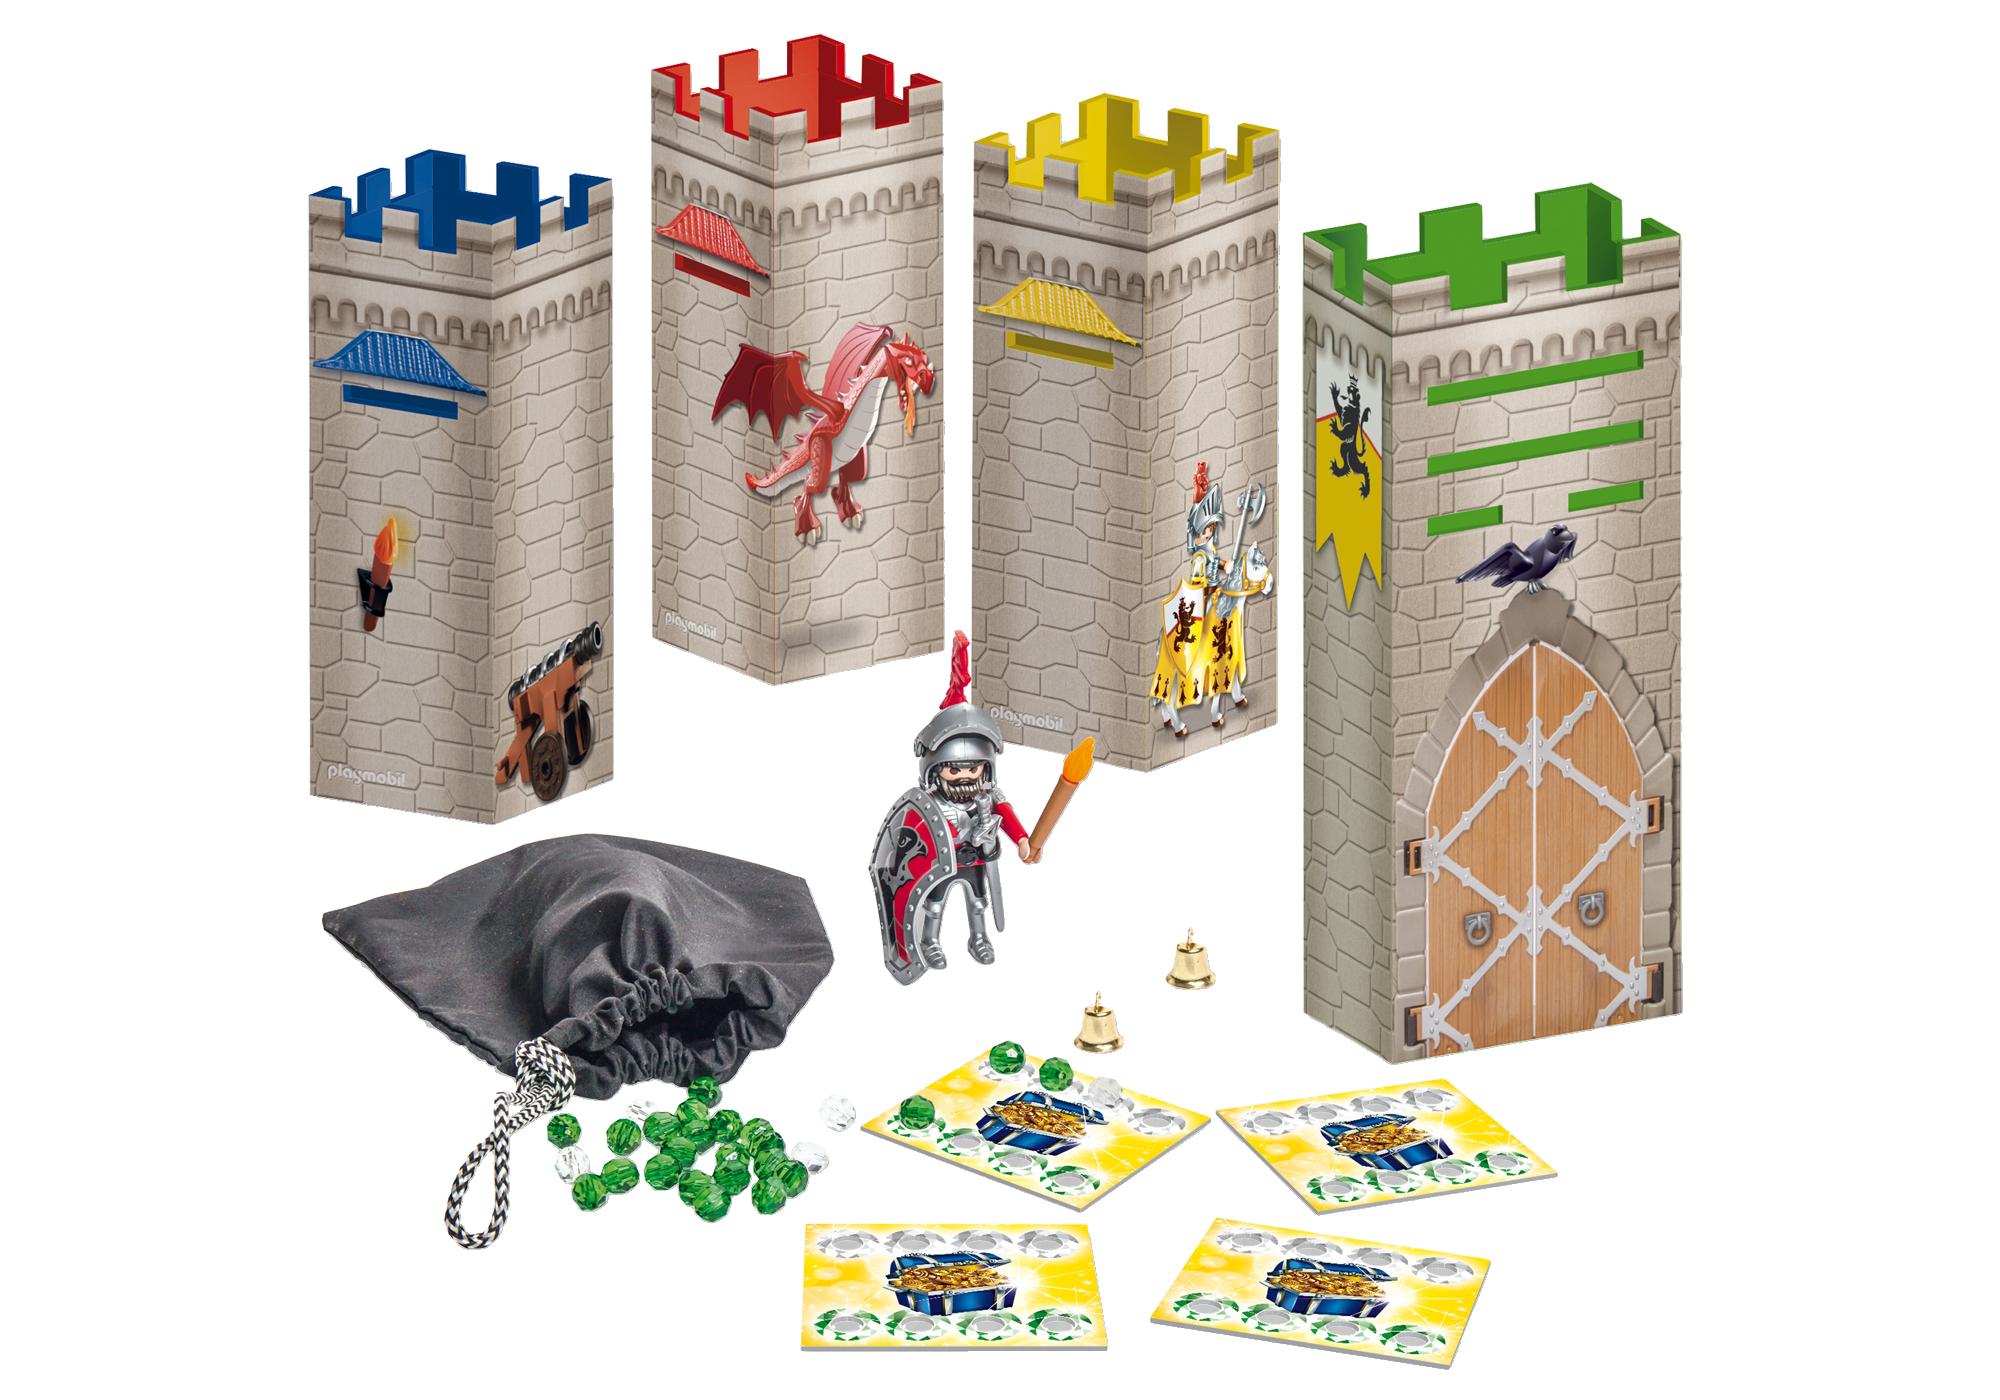 http://media.playmobil.com/i/playmobil/80374_product_box_back/Spiel - Auf der Suche nach dem Edelsteinschatz